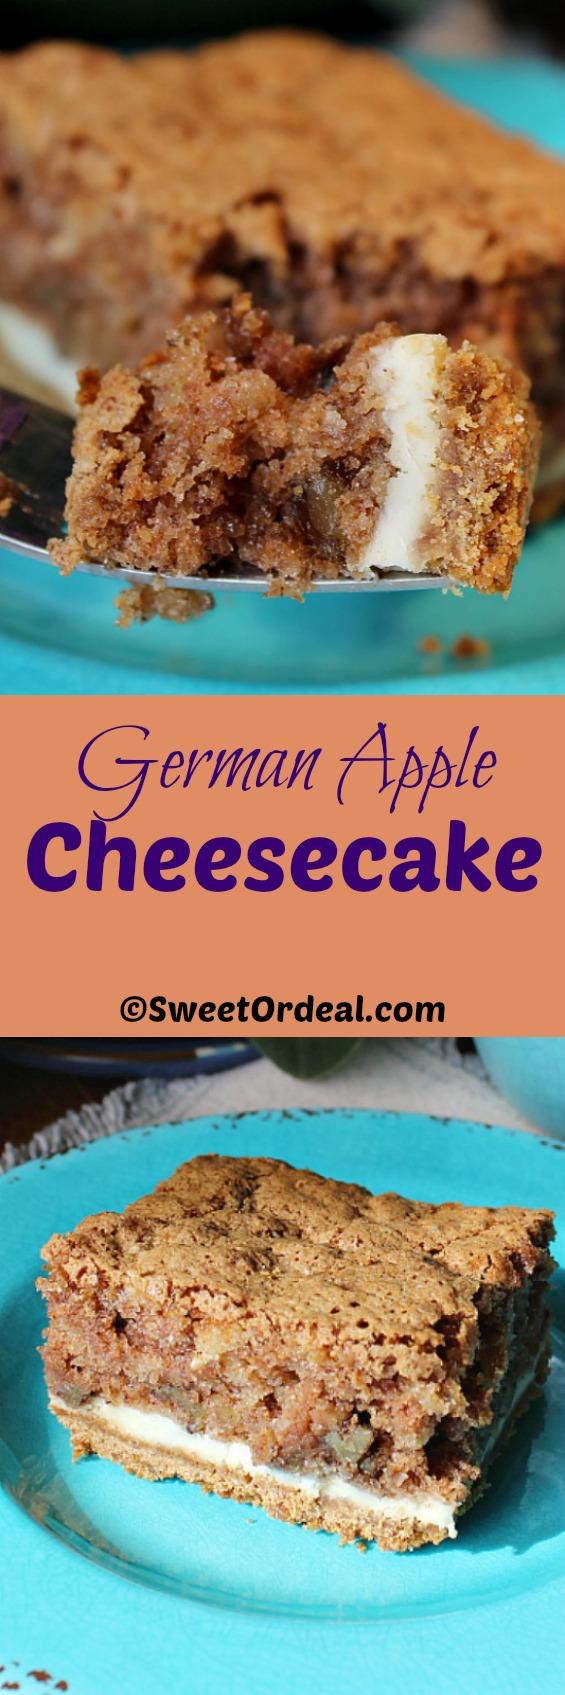 German Apple Cheesecake